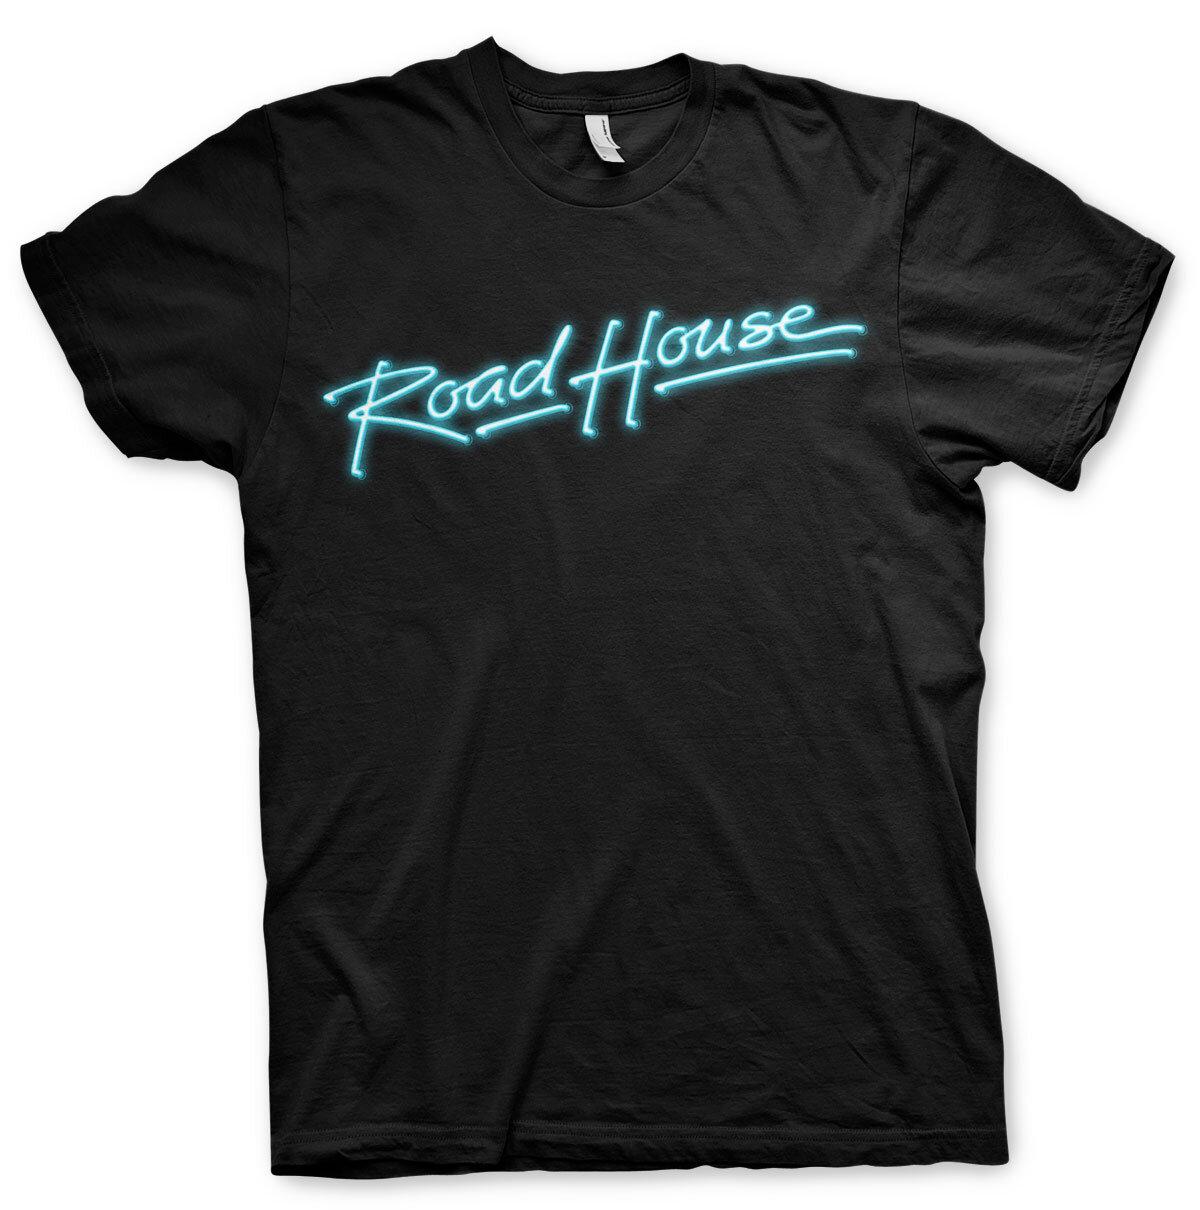 Road House Logo T-Shirt